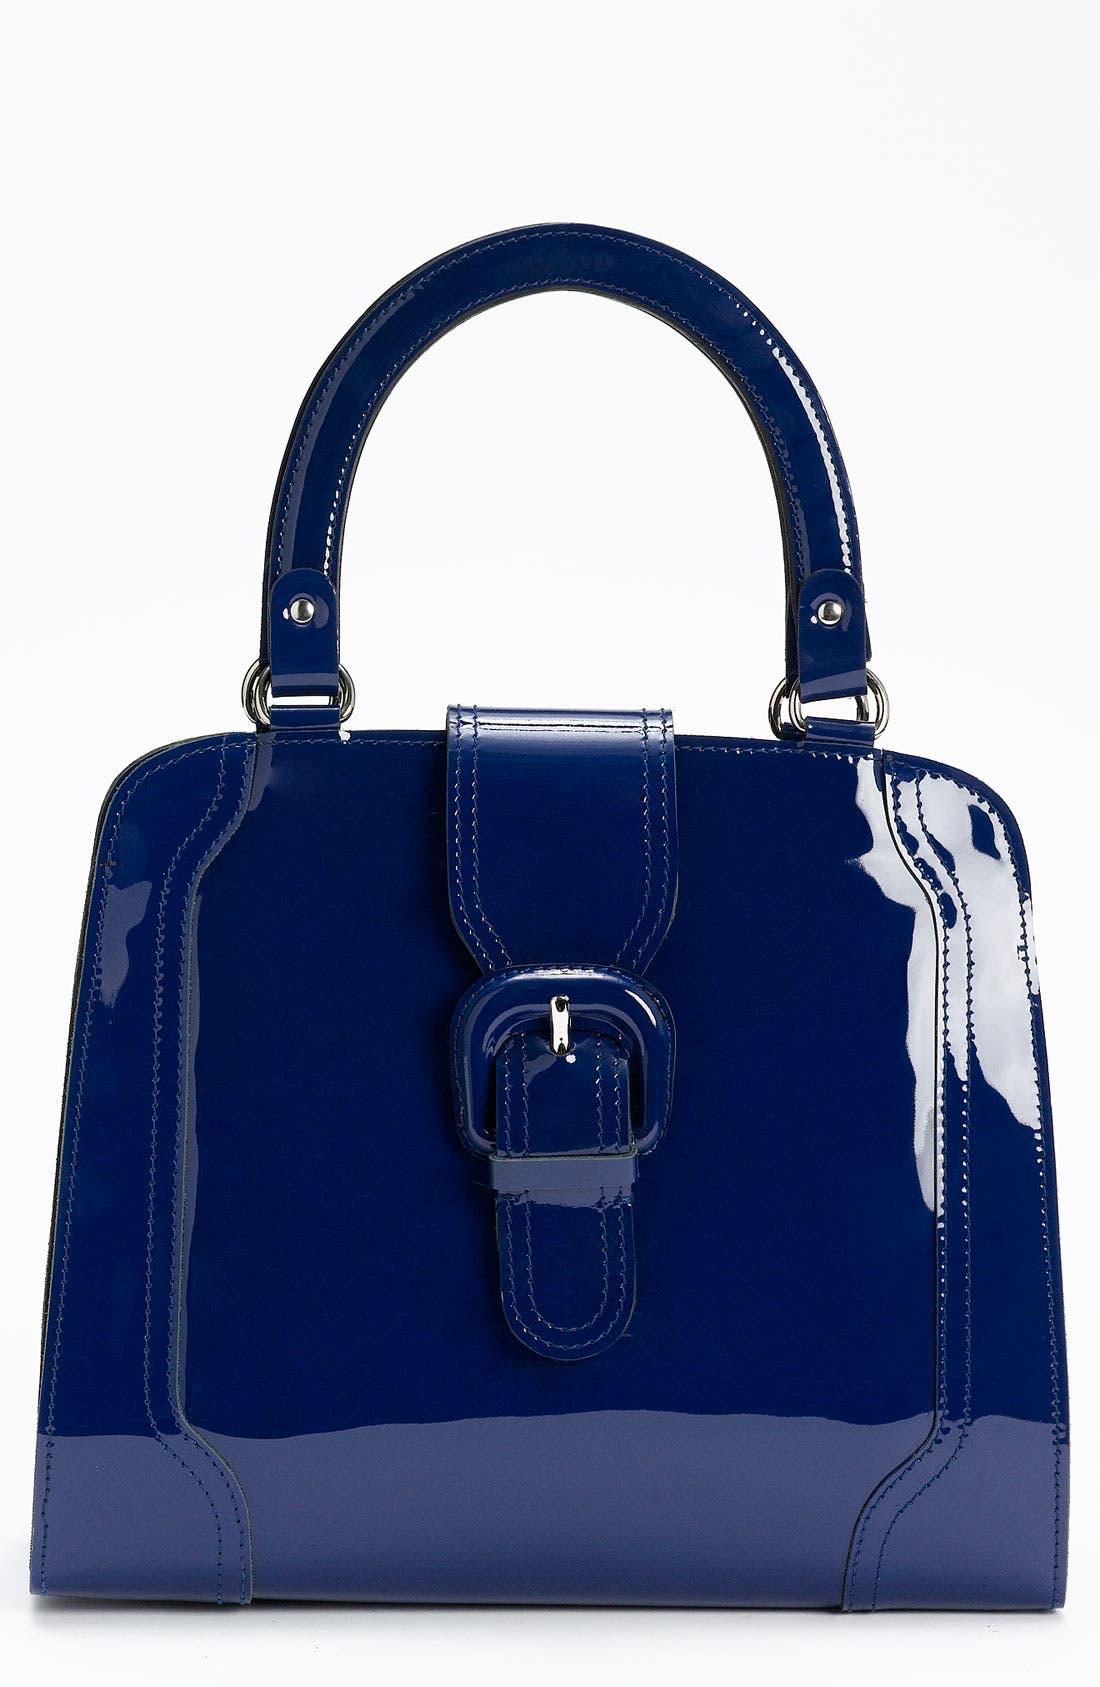 Main Image - Marni 'Medium' Patent Leather Frame Bag